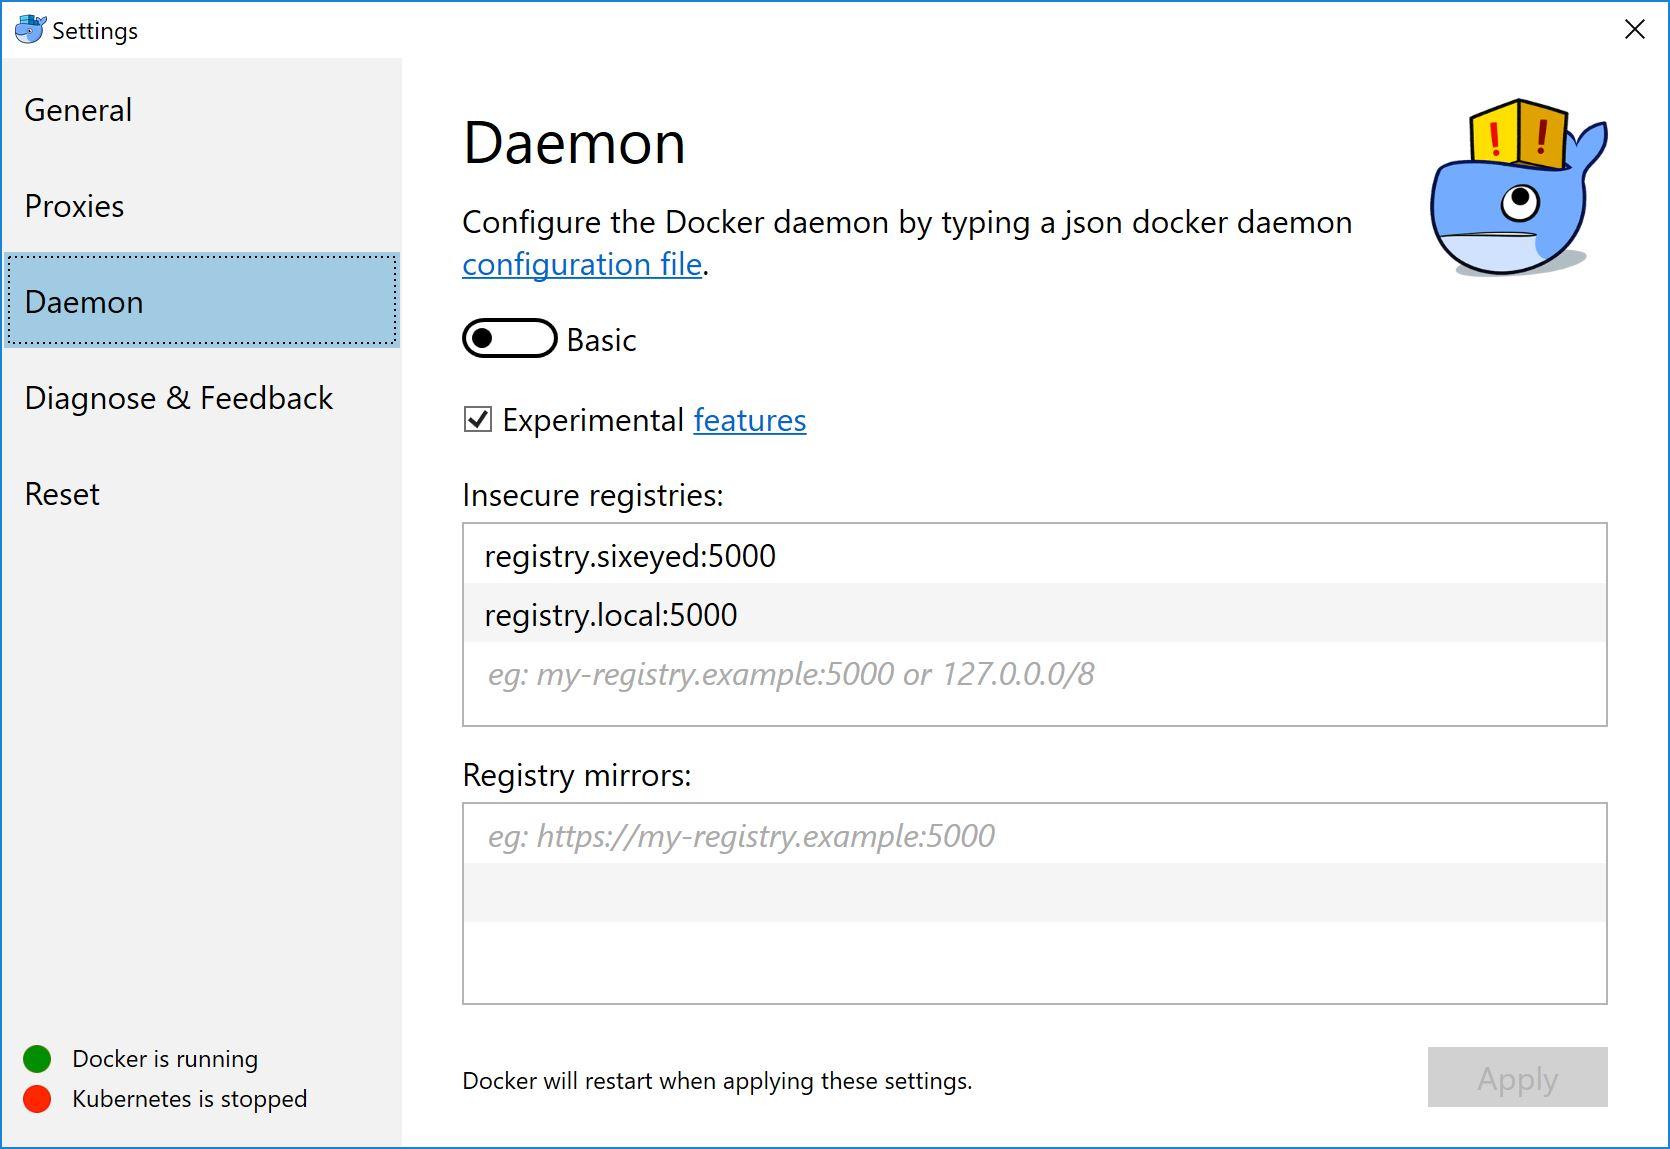 Windows Weekly Dockerfile #20 - from the book Docker on Windows